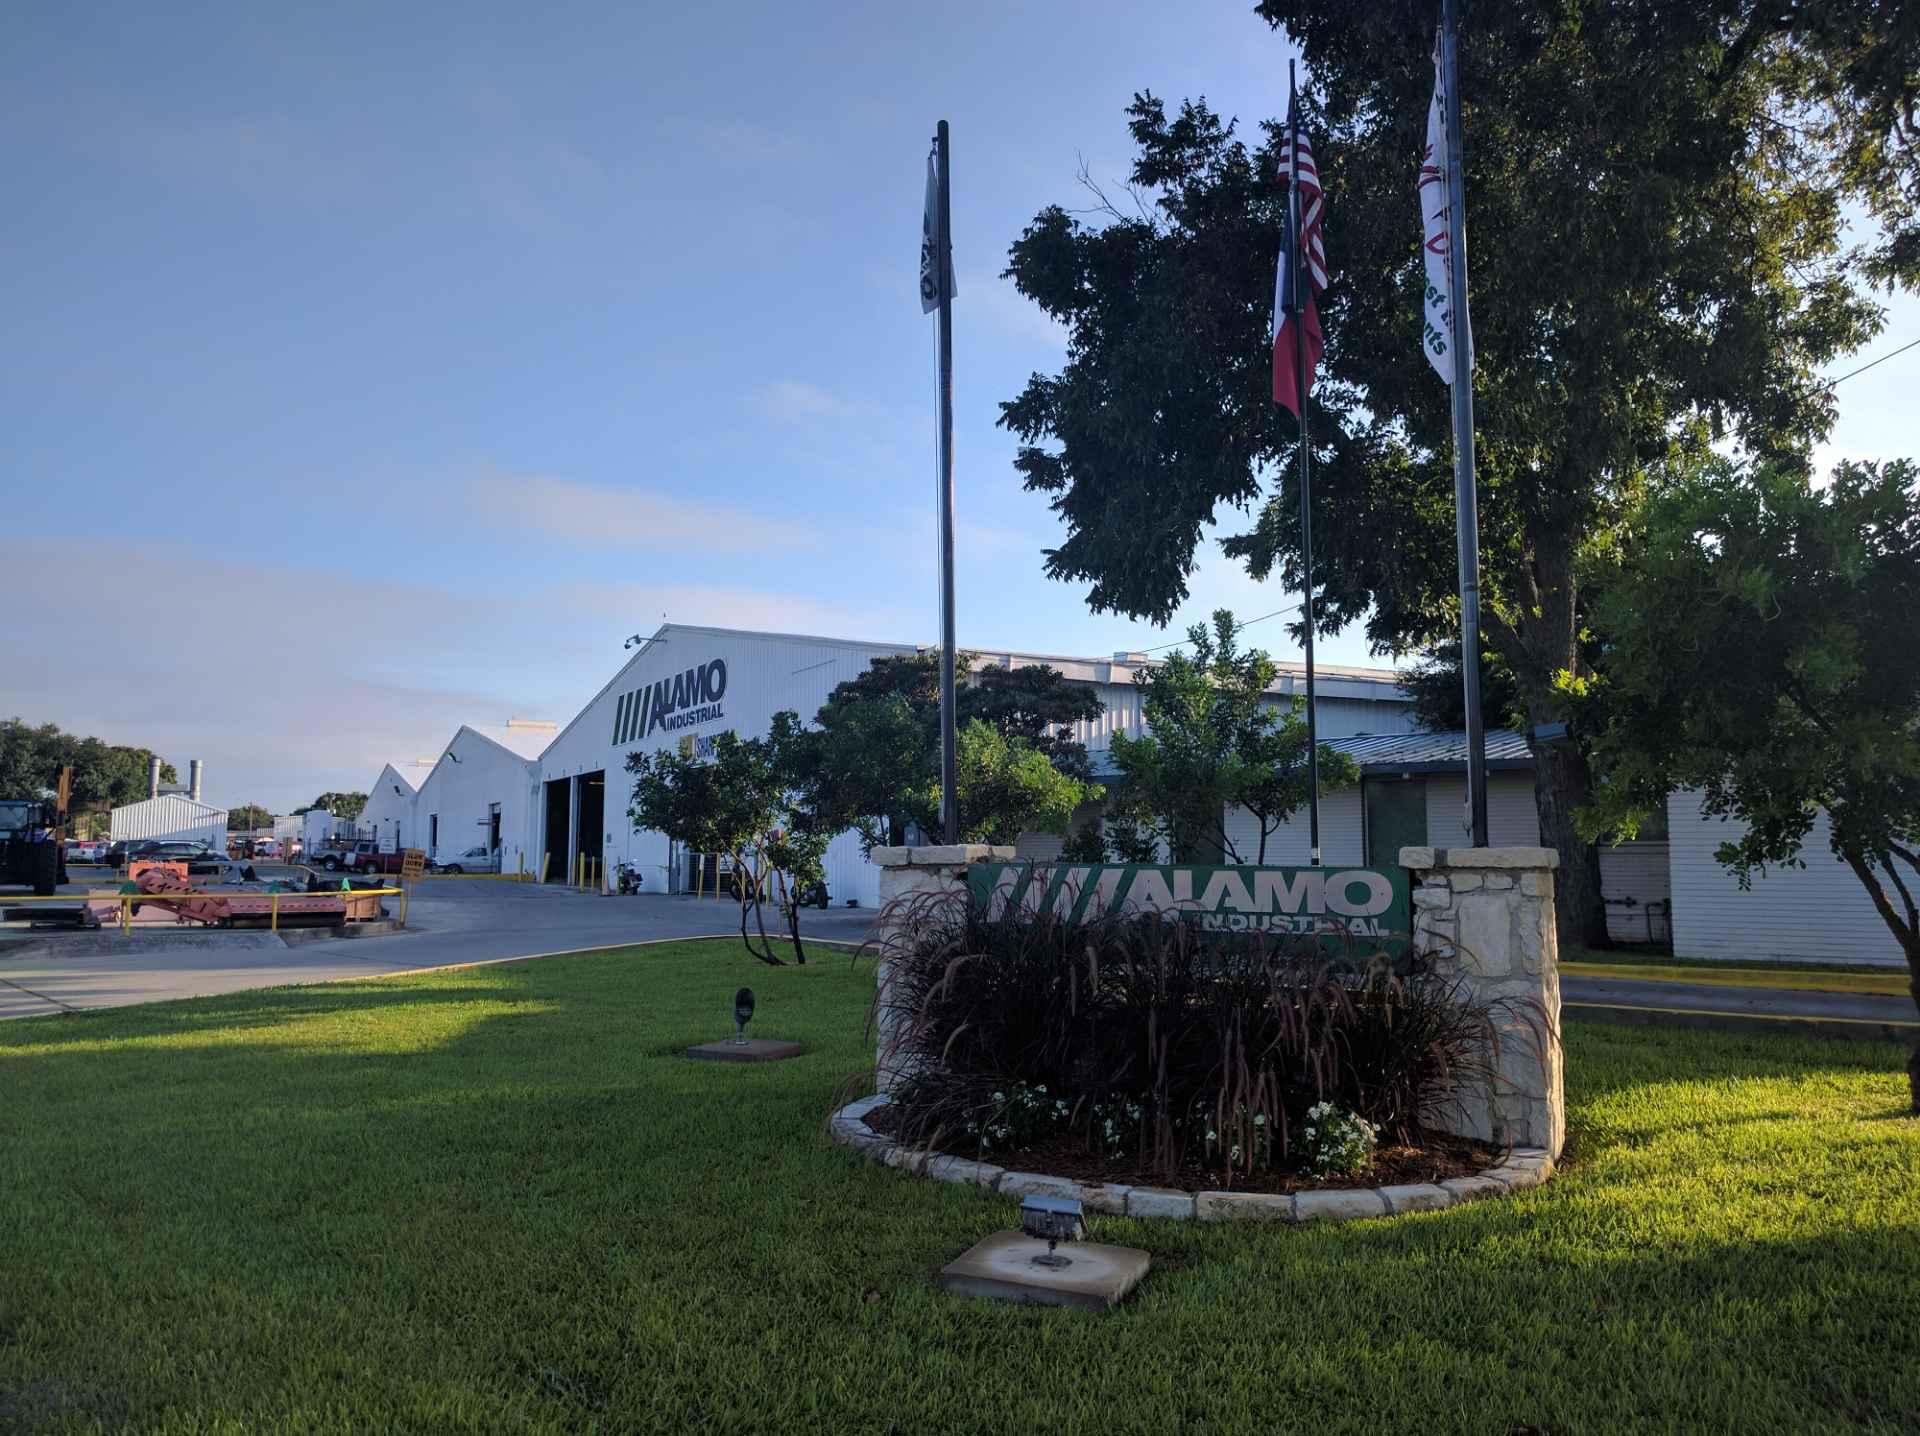 Alamo Group manufacturing facility in Seguin, Texas.